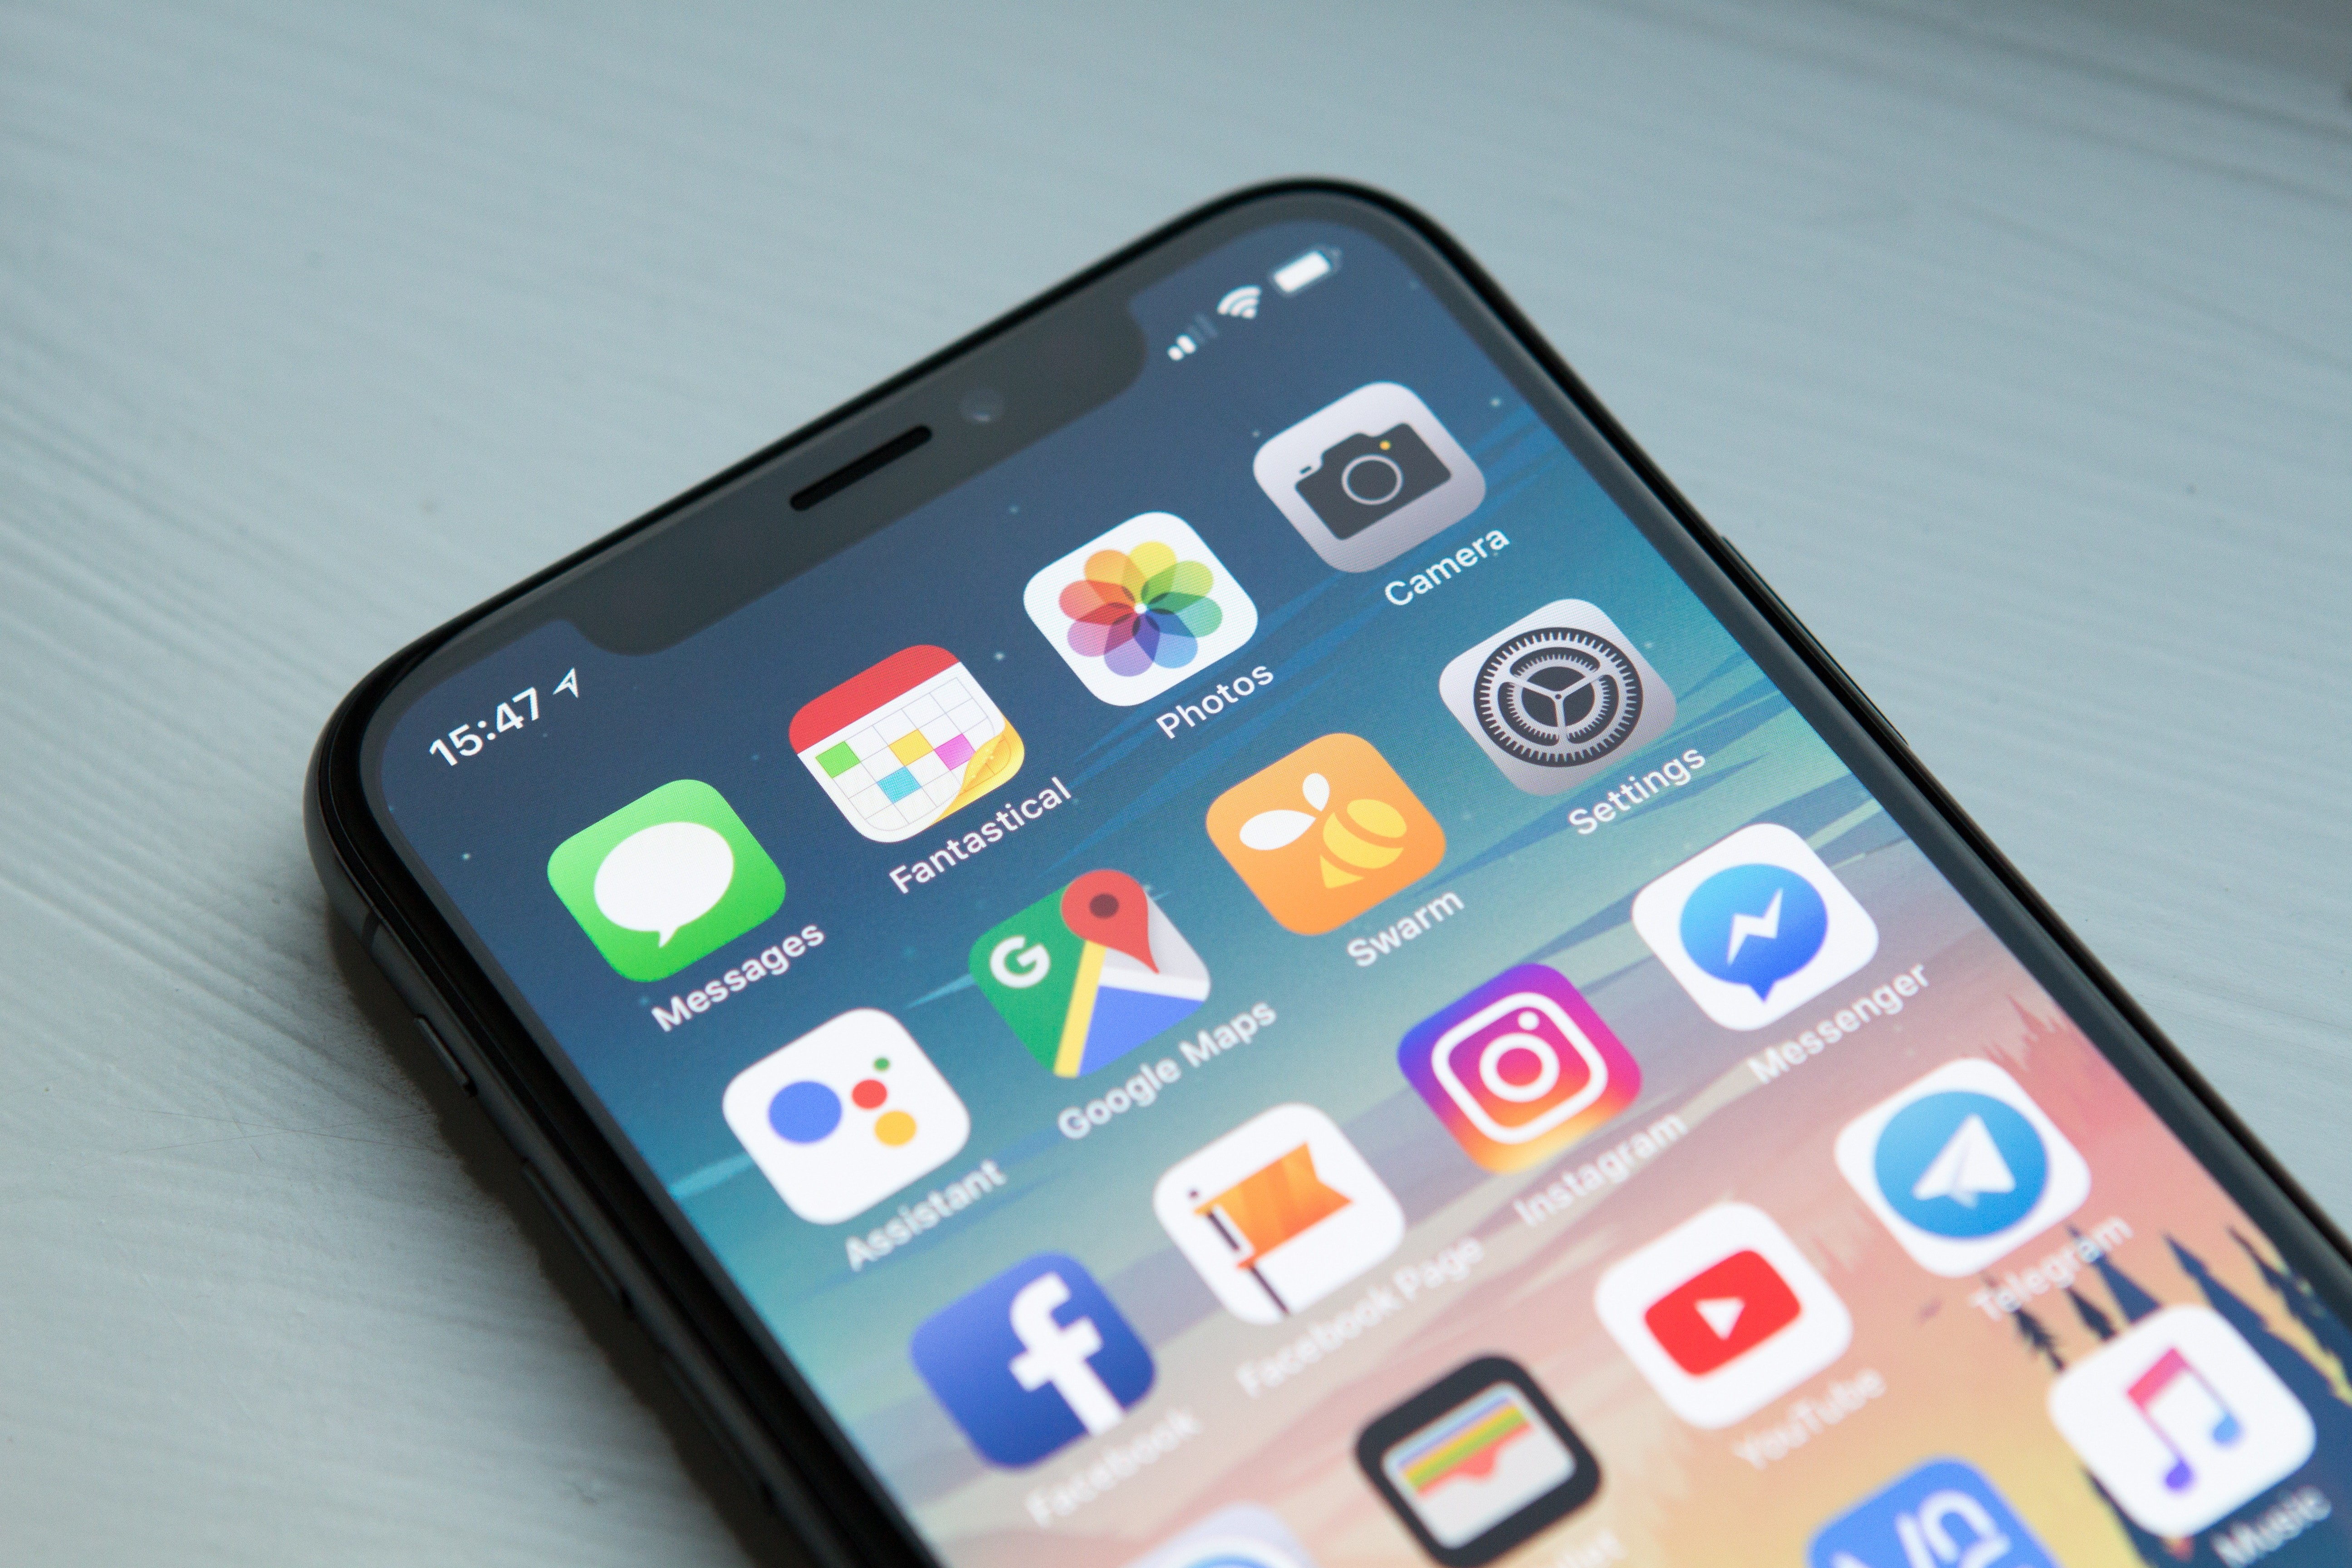 ▲▼iPhone,社群軟體,社群,手機。(圖/取自免費圖庫Unsplash)